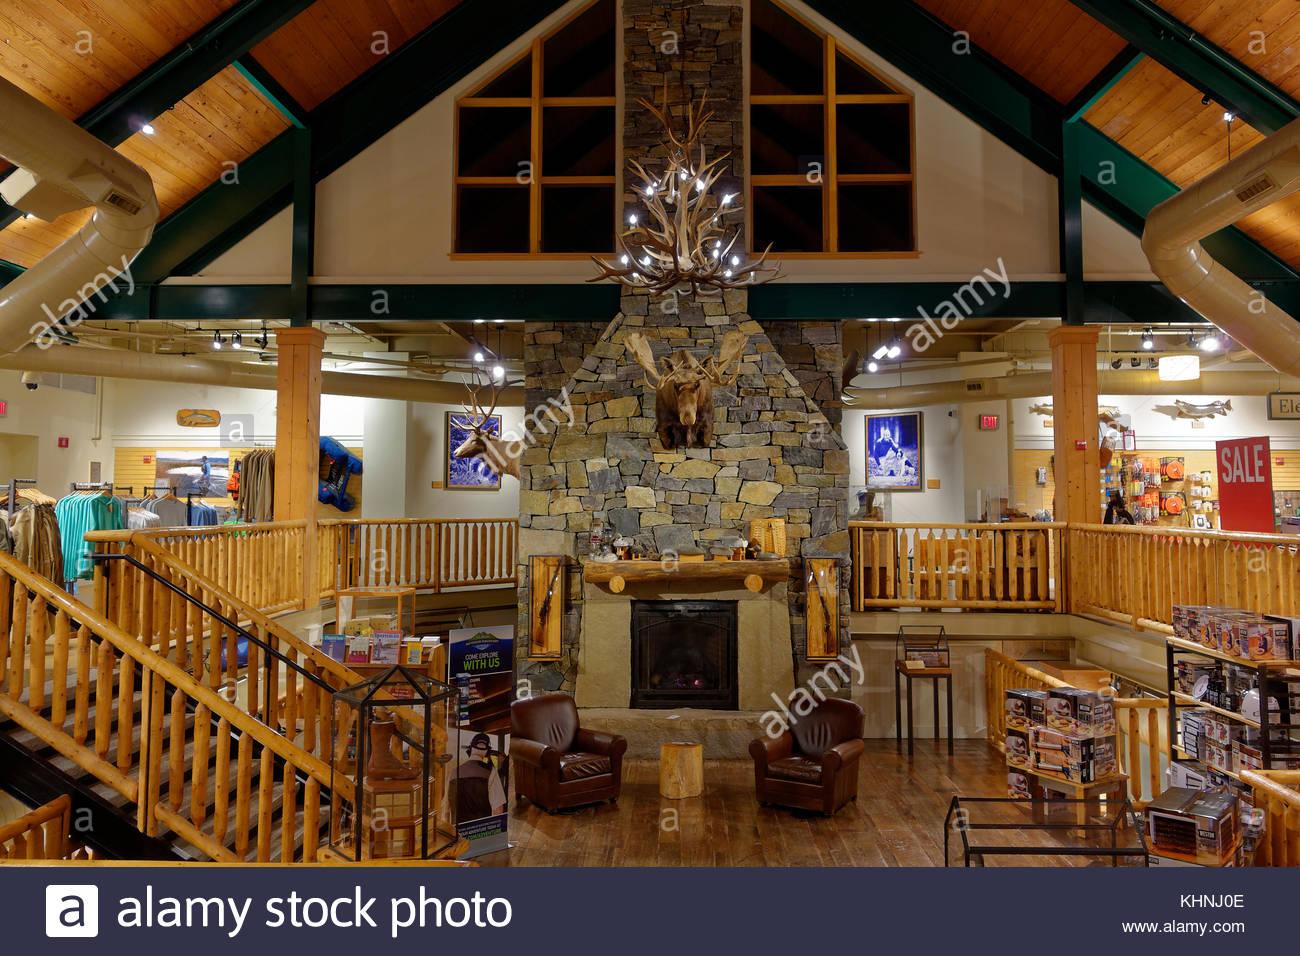 Maine Freeport Stock Photos & Maine Freeport Stock Images - Alamy